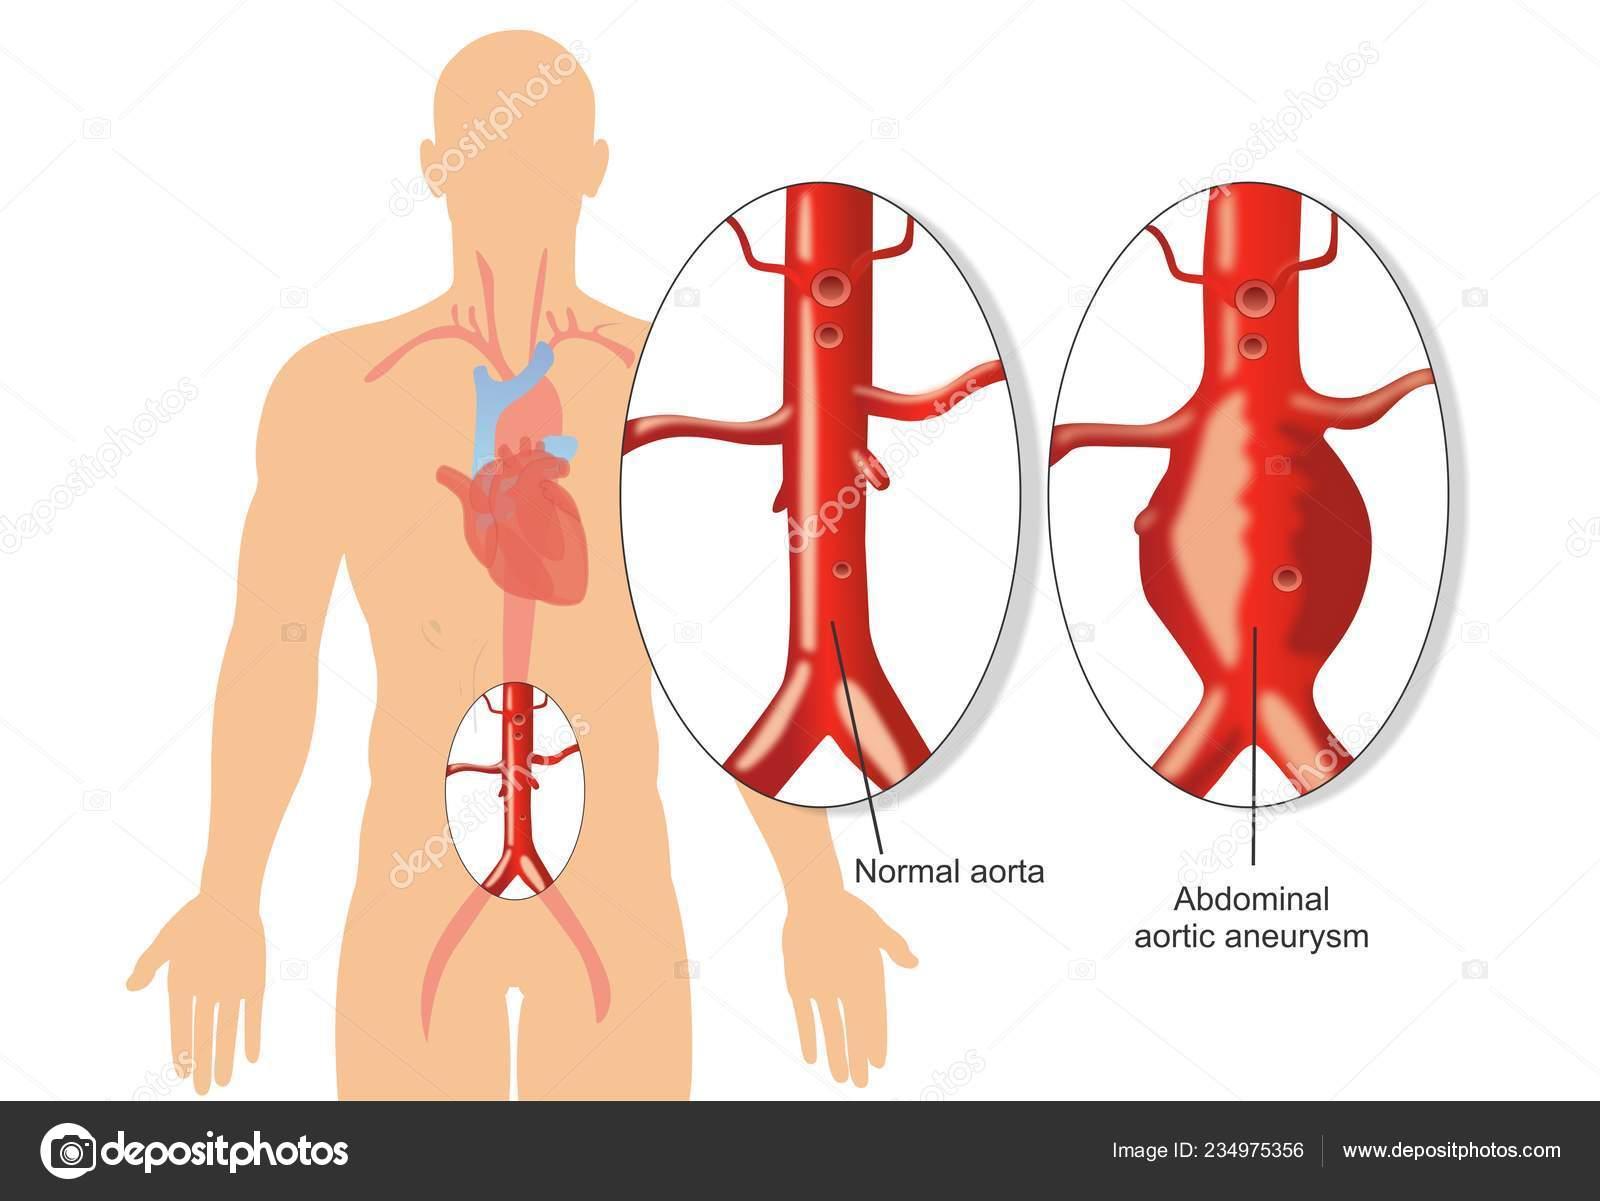 hight resolution of abdominal aortic aneurysm diagram stock illustration